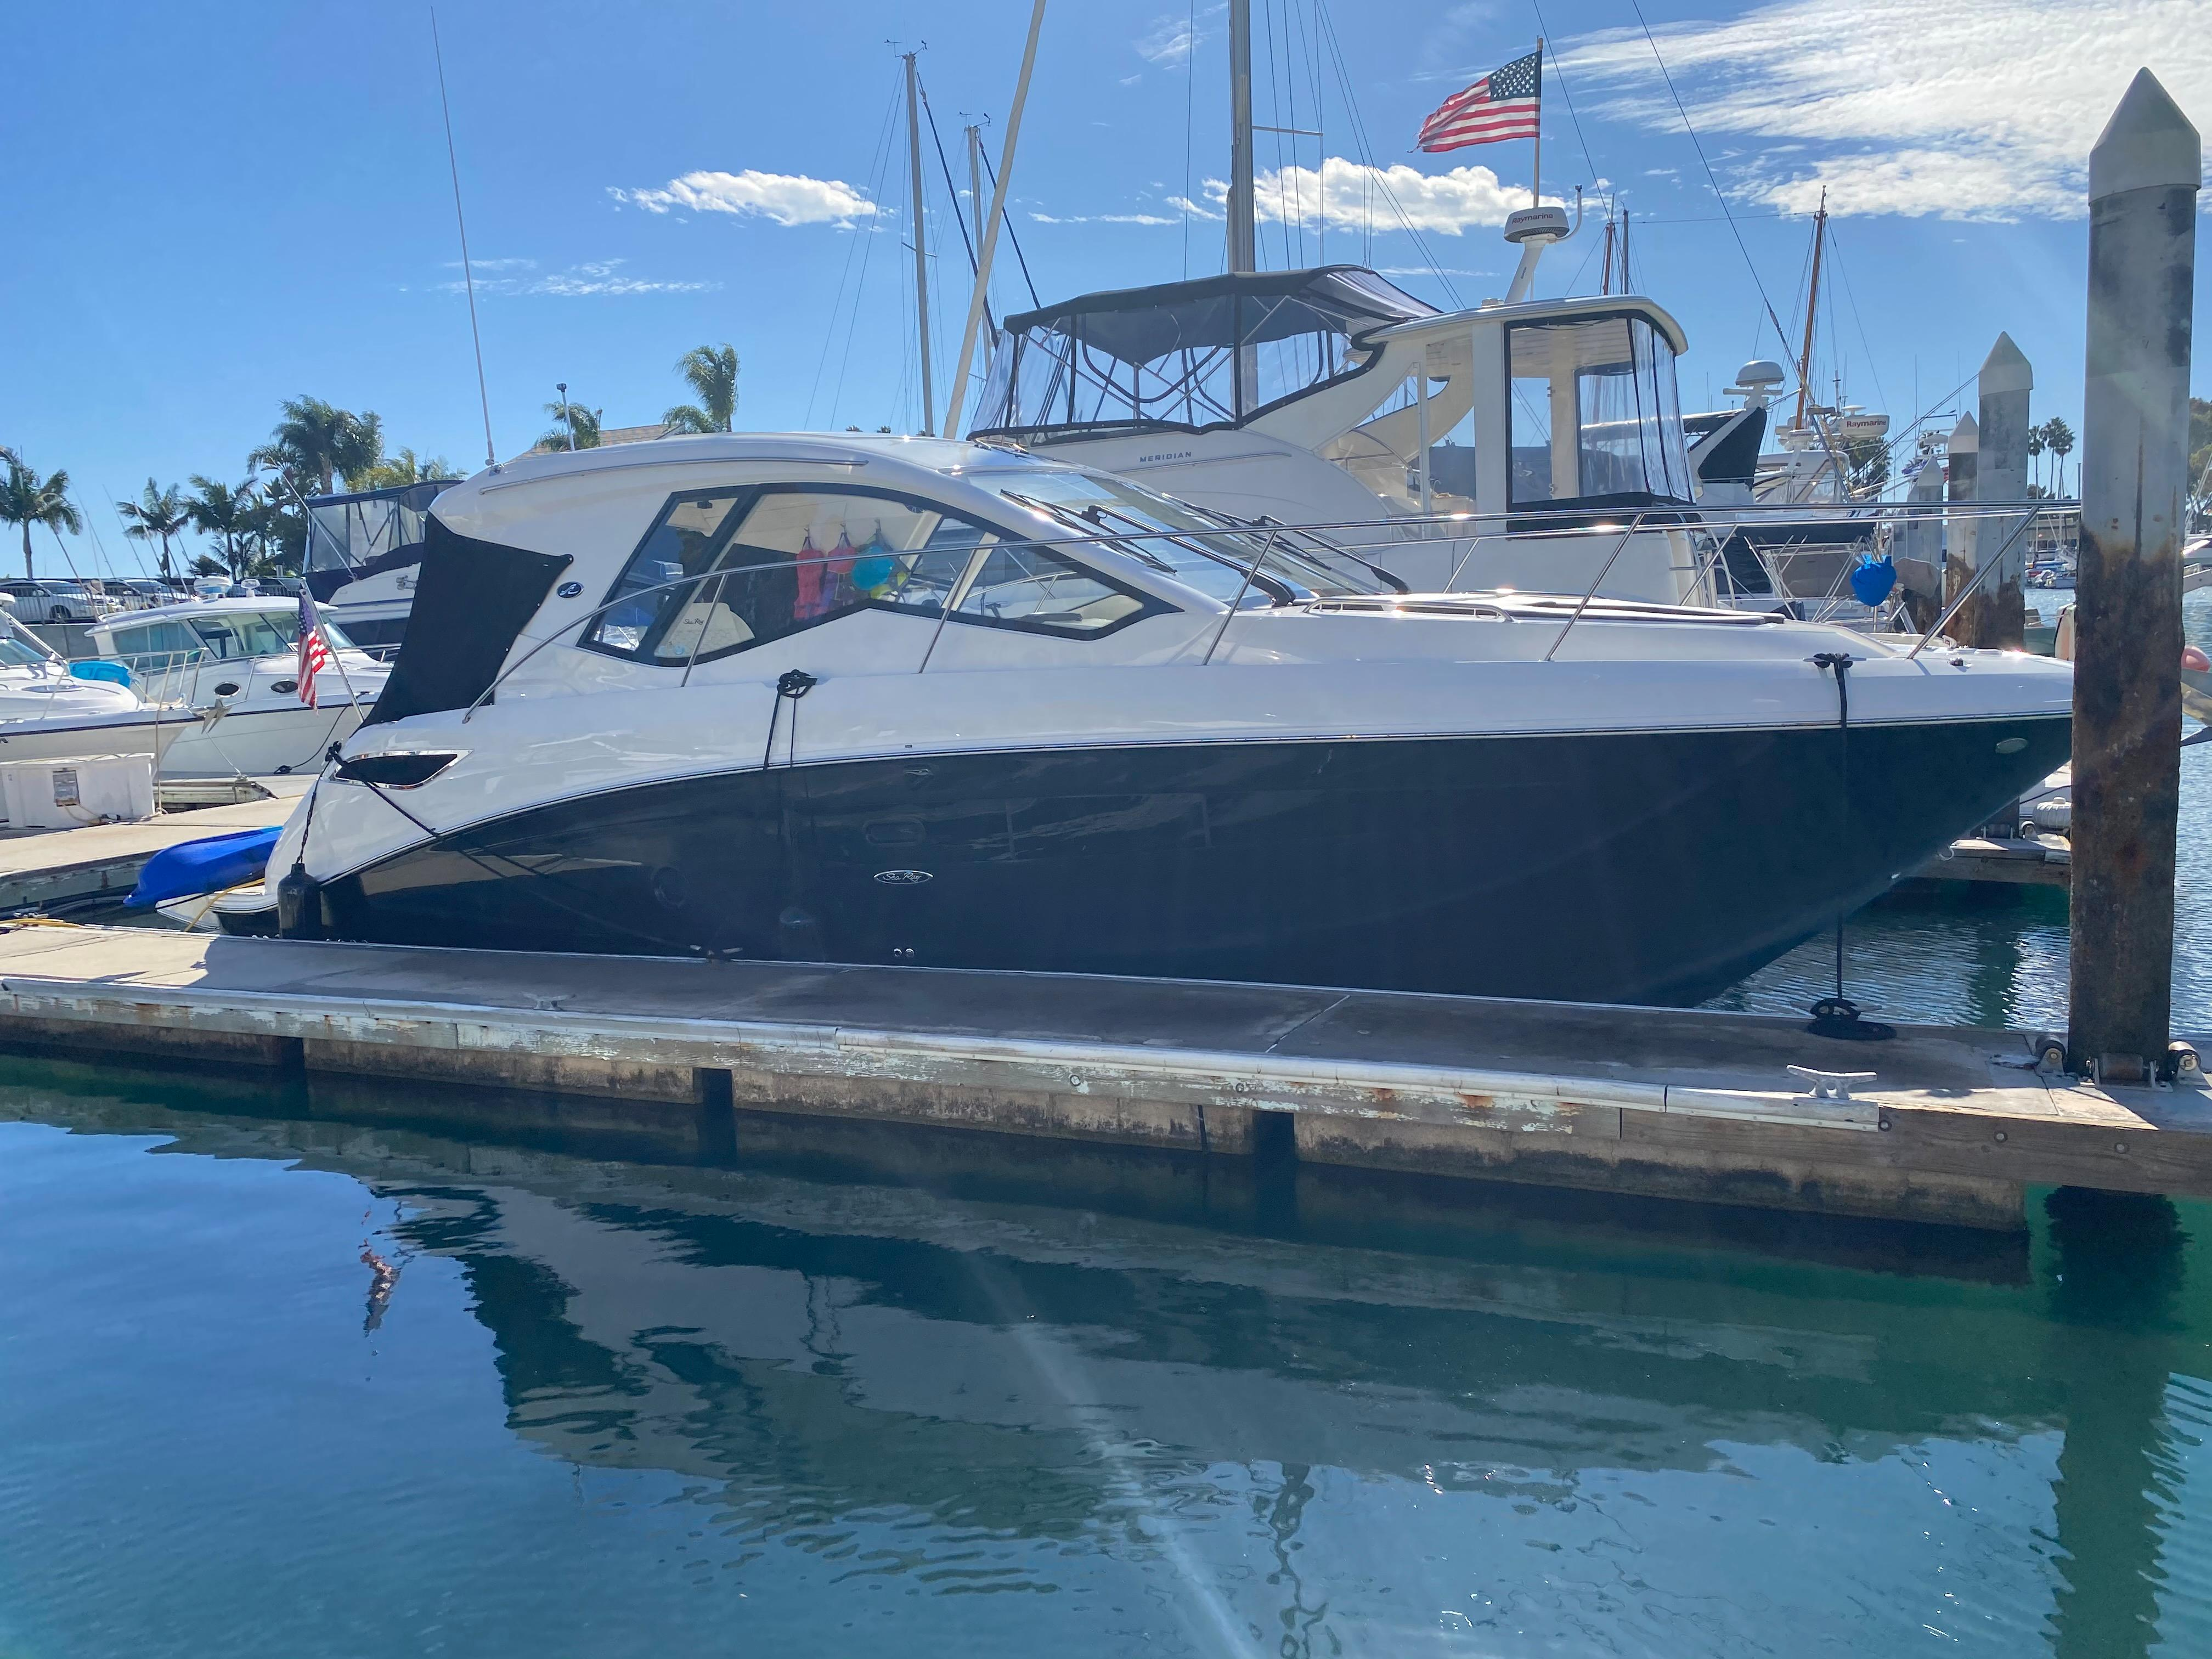 2020 Sea Ray 350 Sundancer #TB1607MC inventory image at Sun Country Coastal in Dana Point